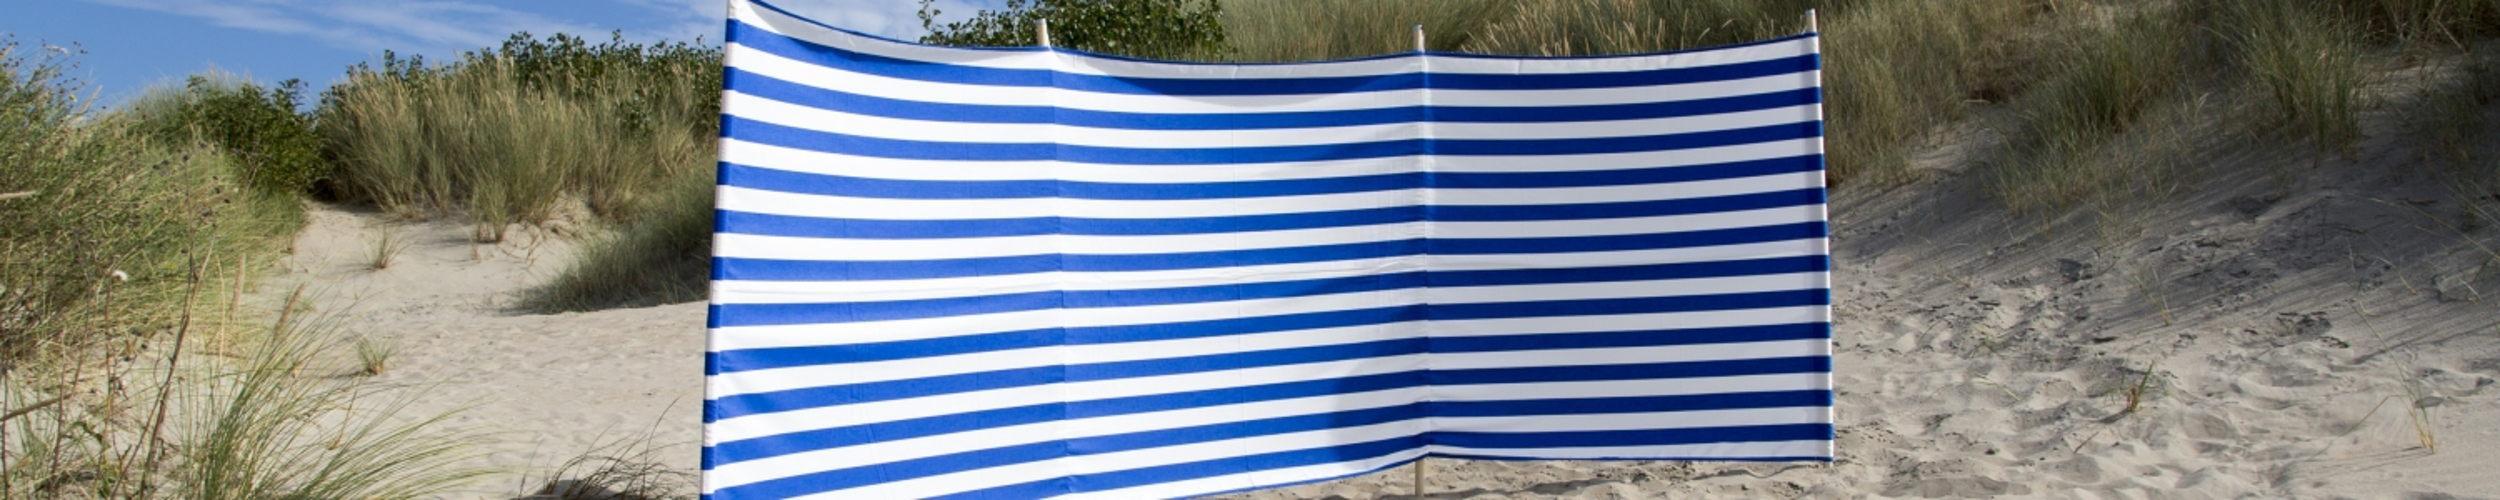 Windschermen, tuinschermen, strandschermen